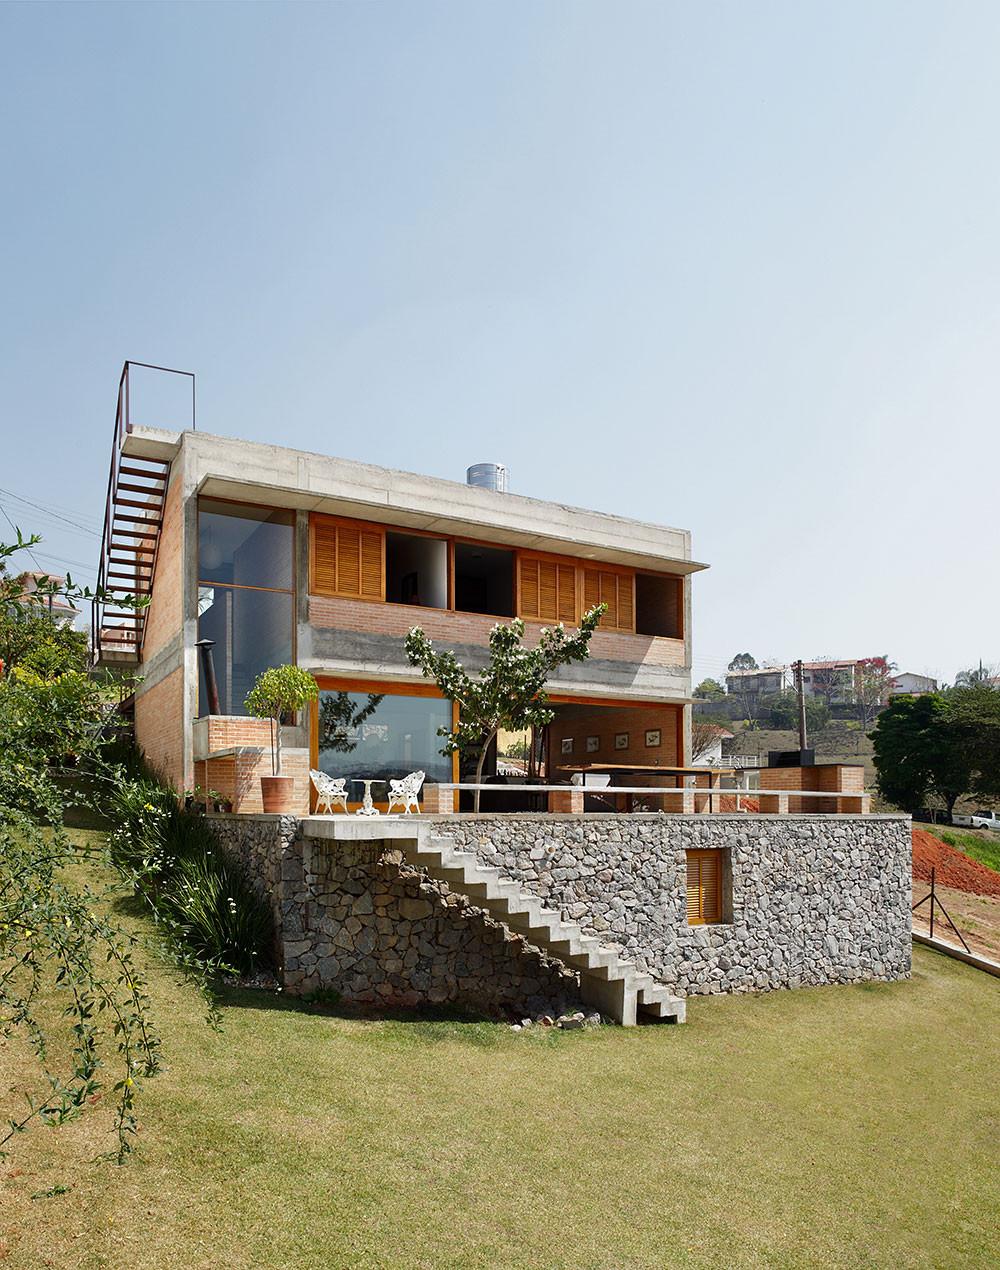 House in bragan a paulista centro arquitetura archdaily for Casa moderna venezia